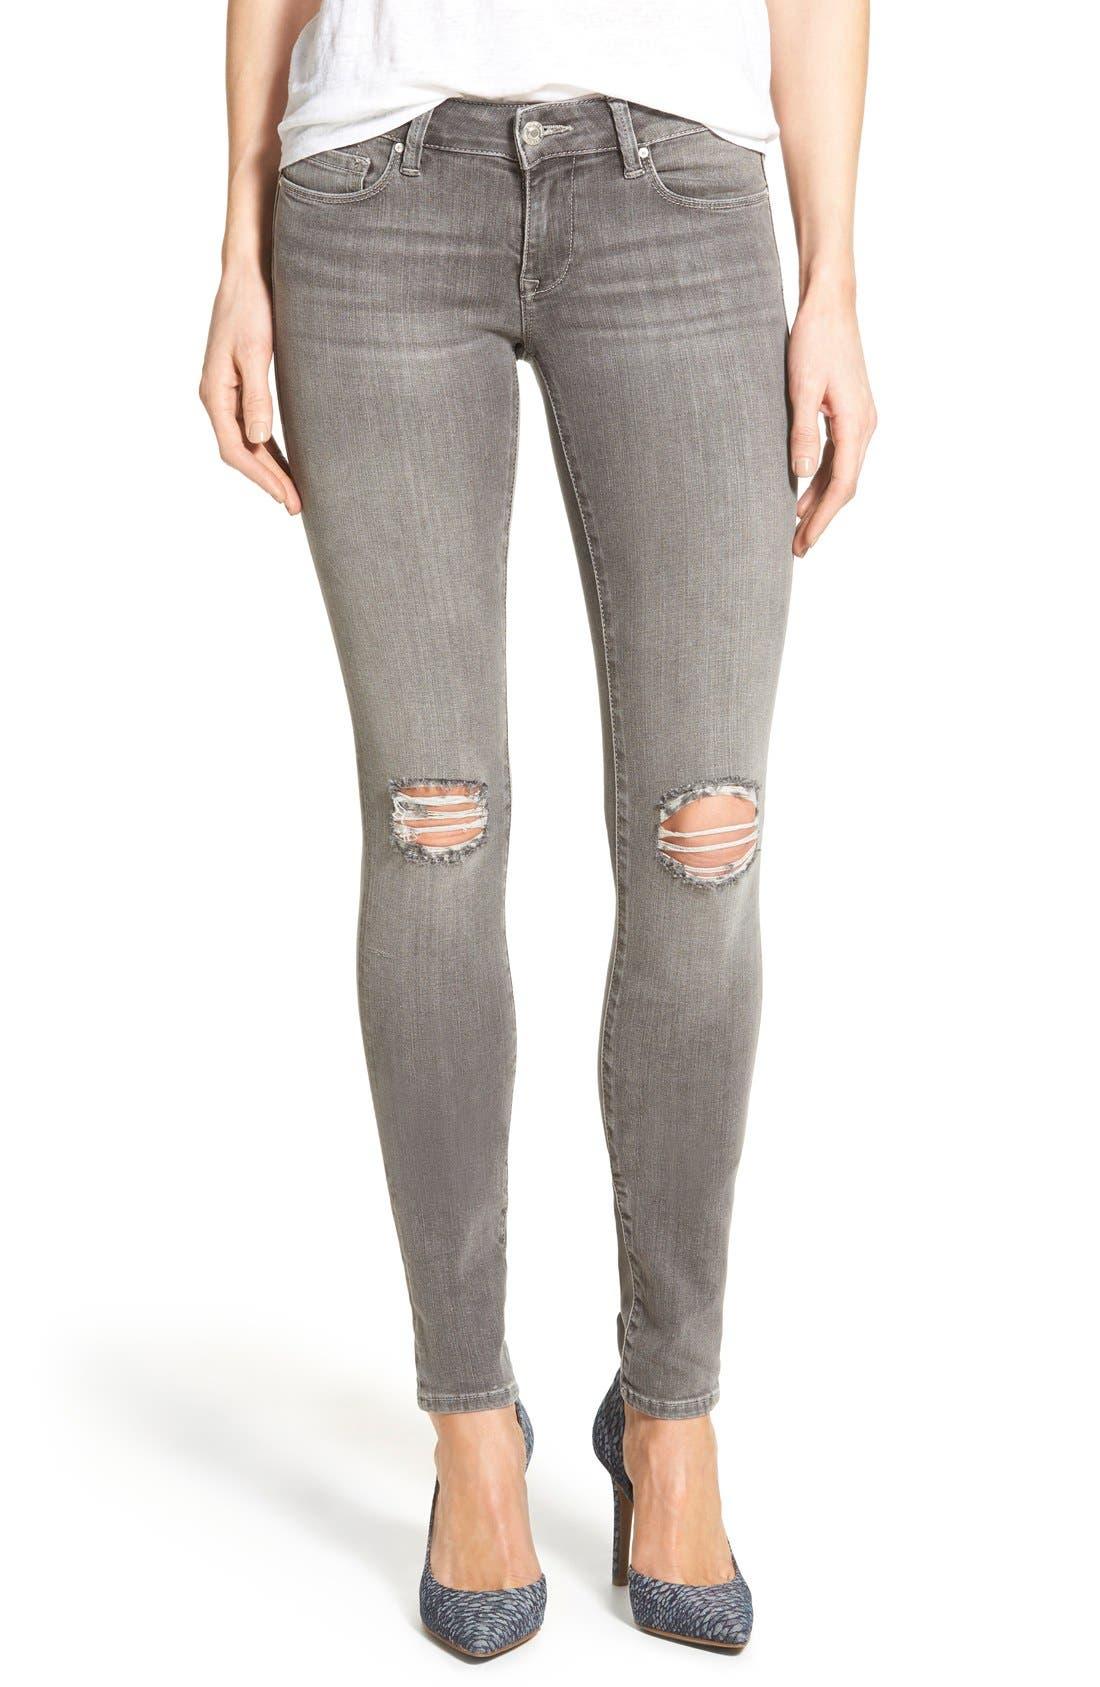 Alternate Image 1 Selected - Mavi Jeans 'Serena' Distressed Stretch Skinny Jeans (Grey Ripped)